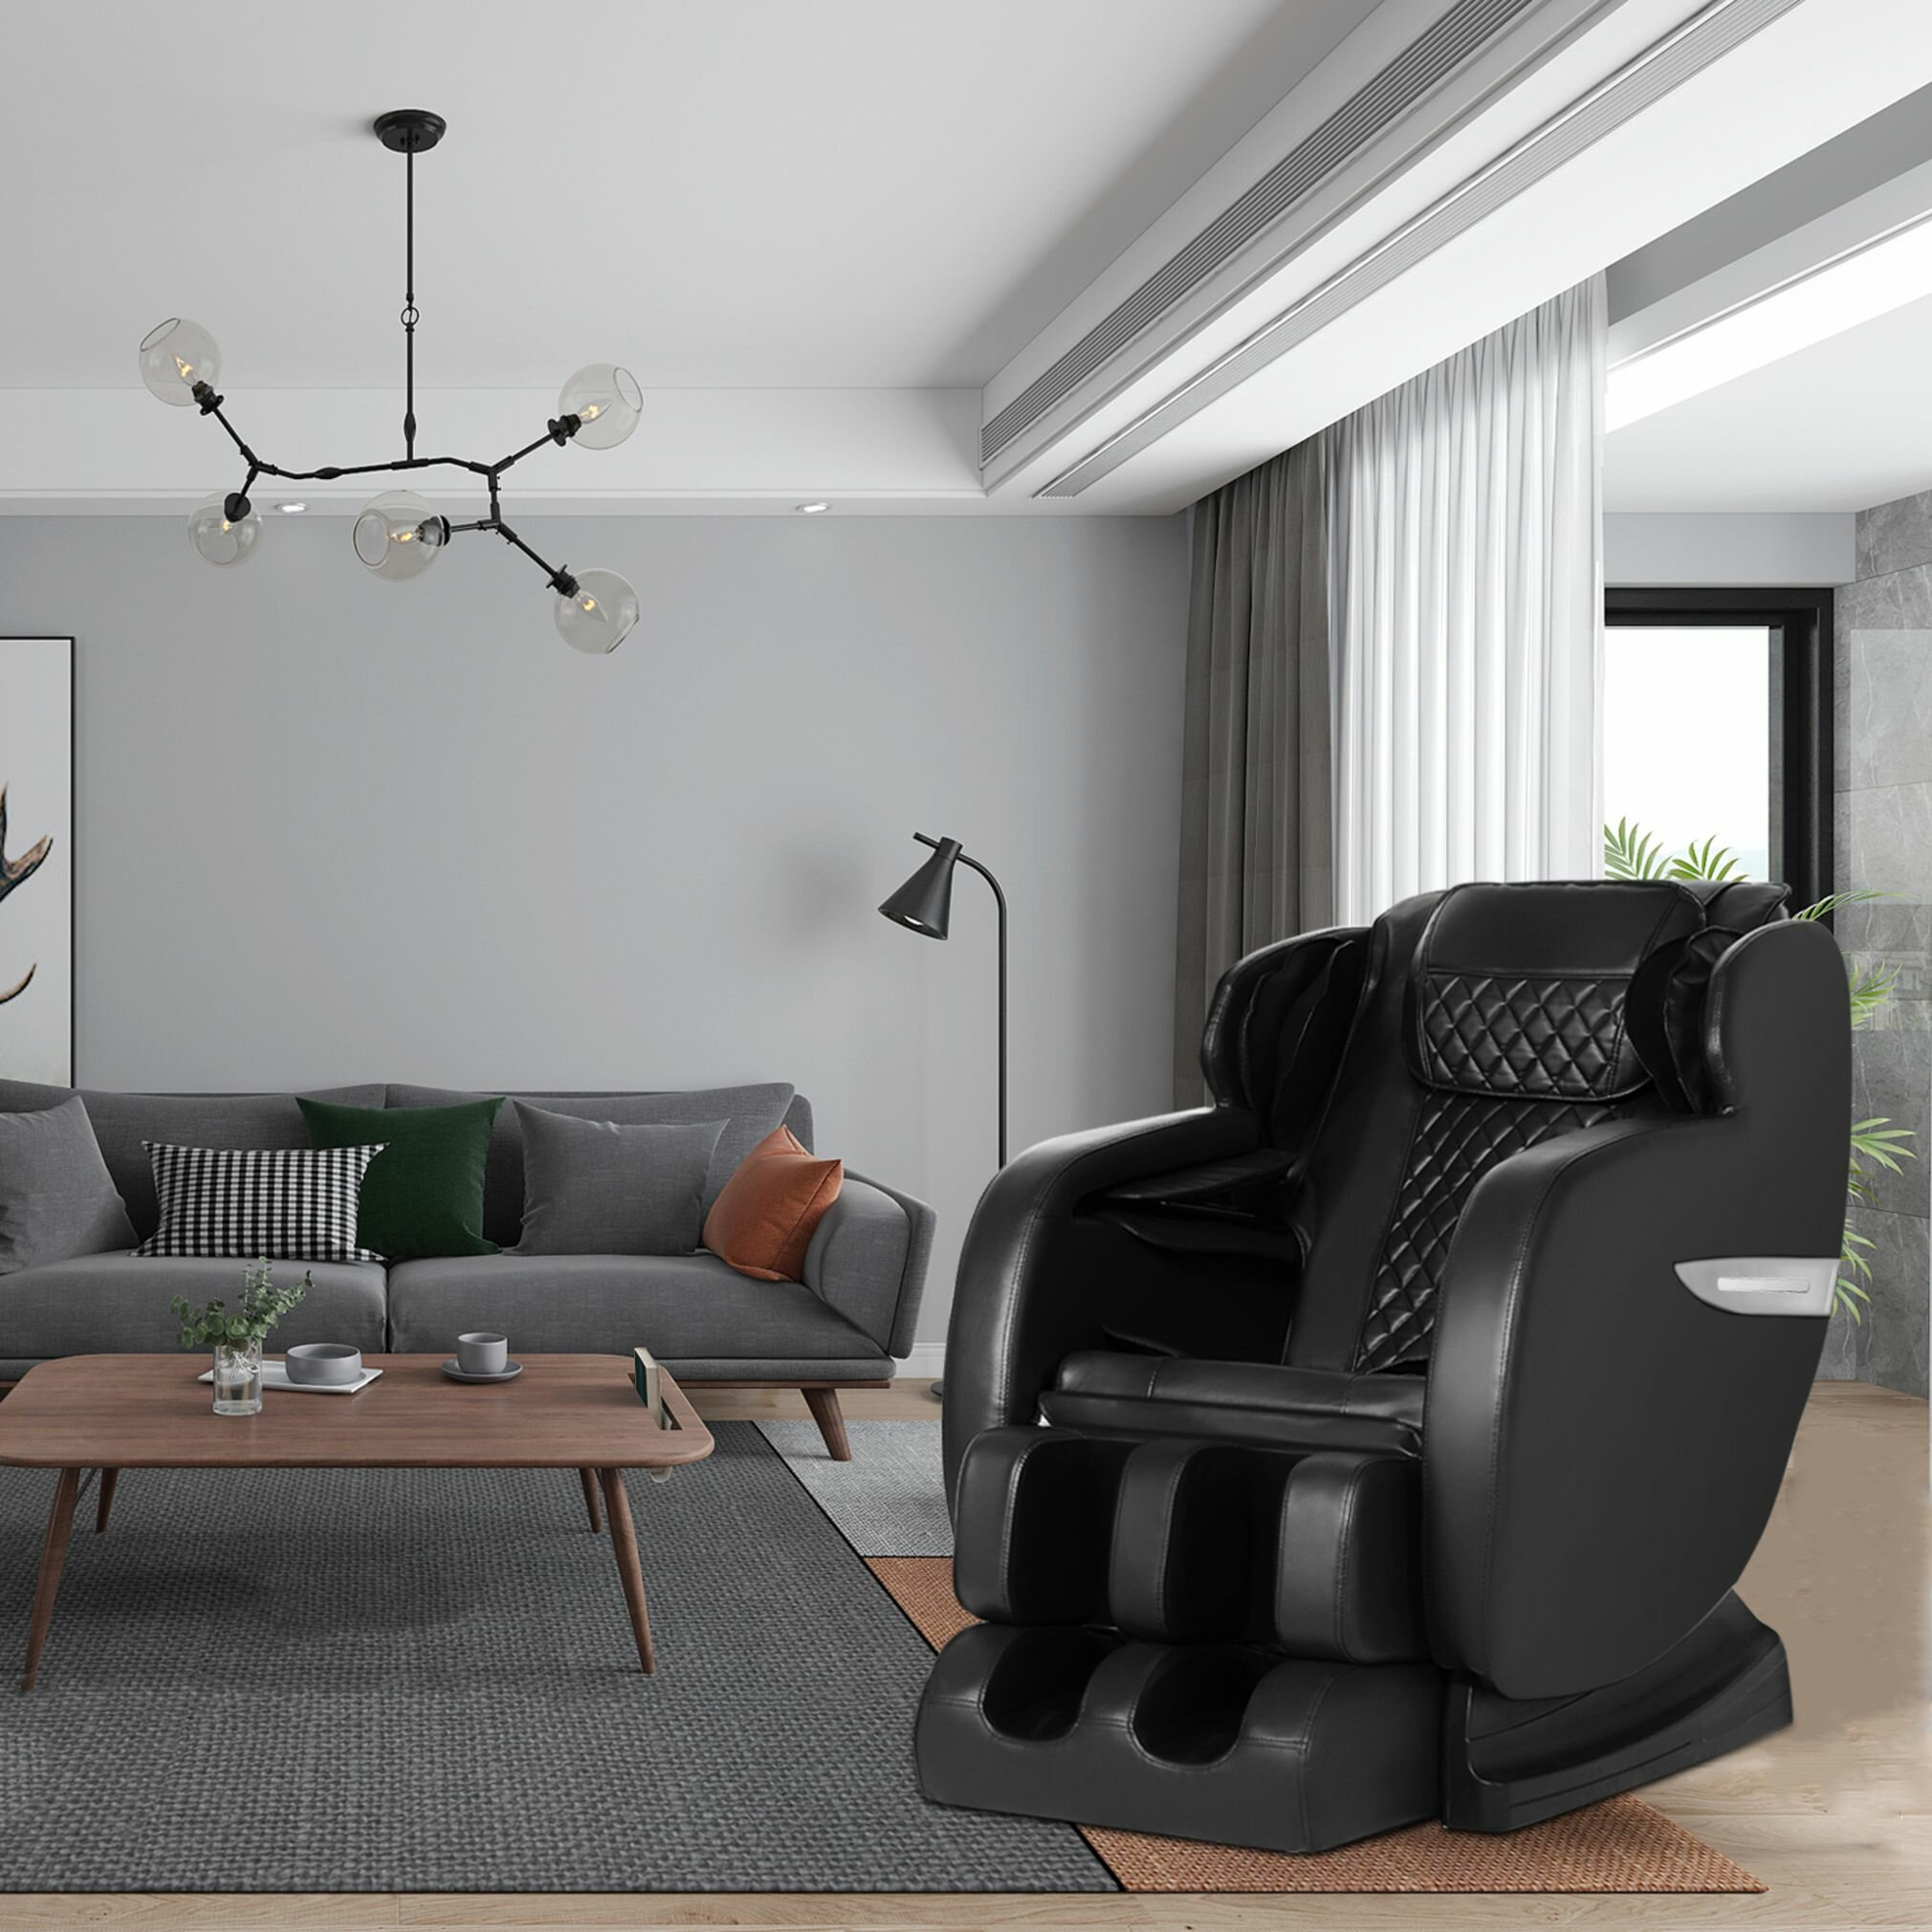 Ugears Heated Full Body Massage Chair